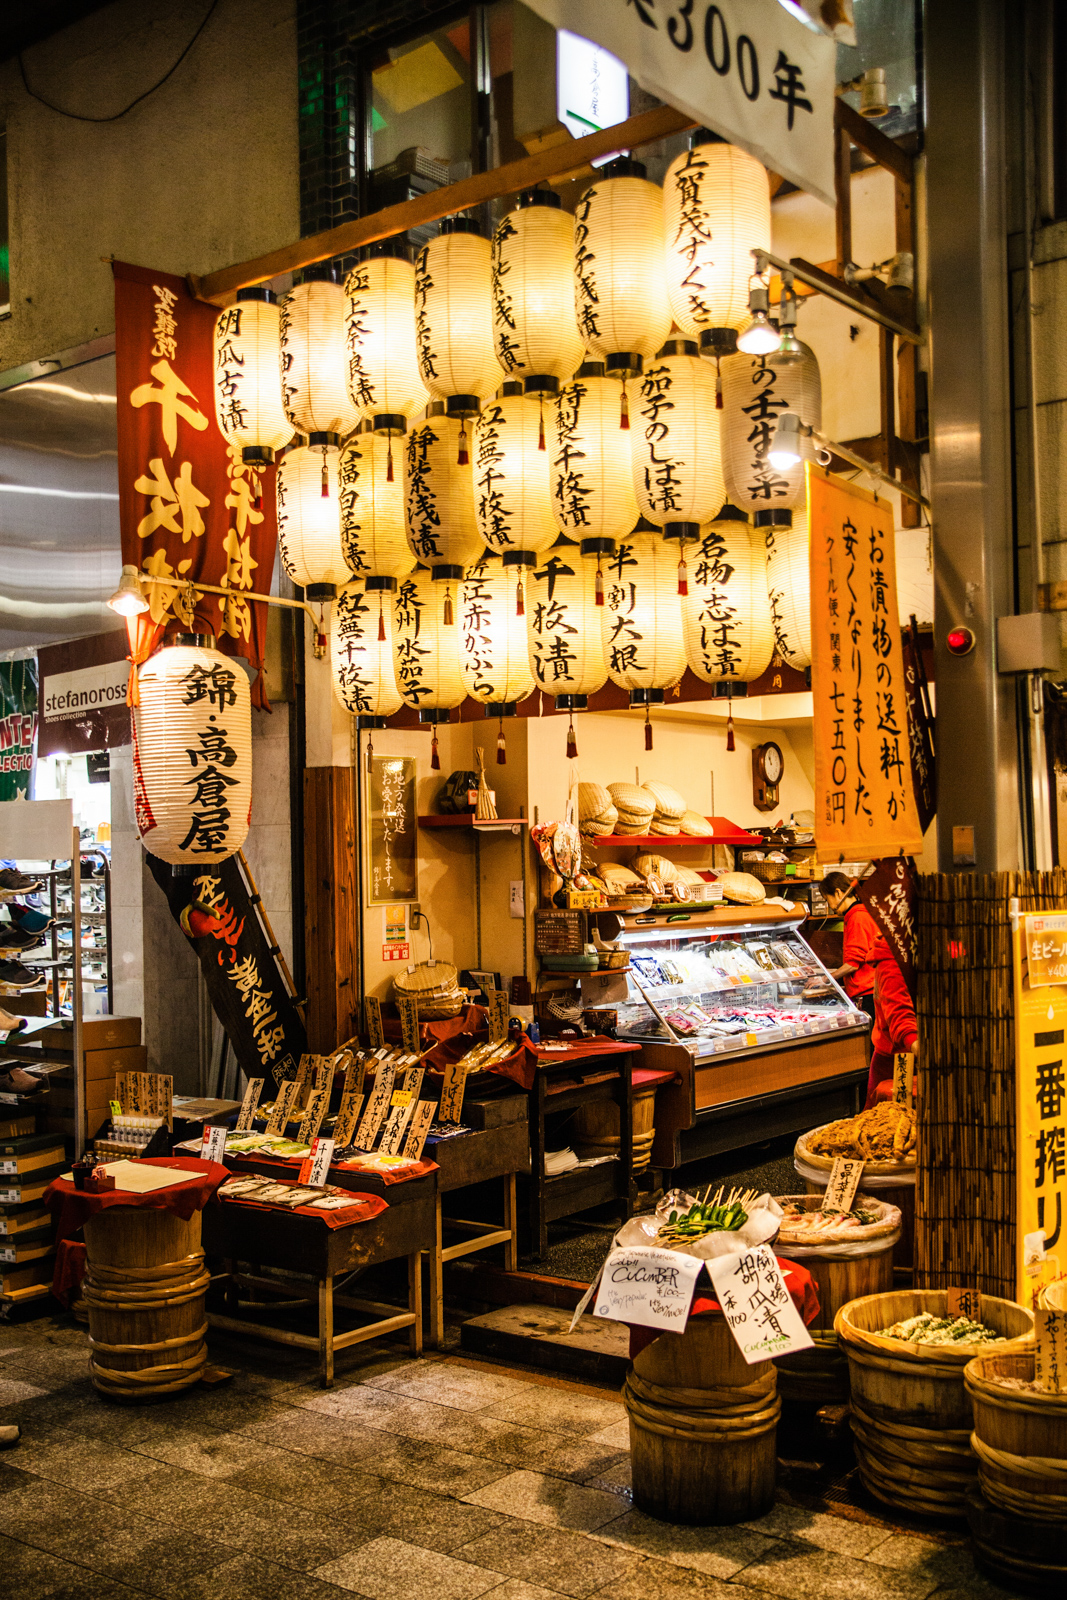 kyoto, kyoto automne, fall kyoto, momiji kyoto, tourisme kyoto, que faire à kyoto, voyage kyoto, nishiki market, marché nishiki